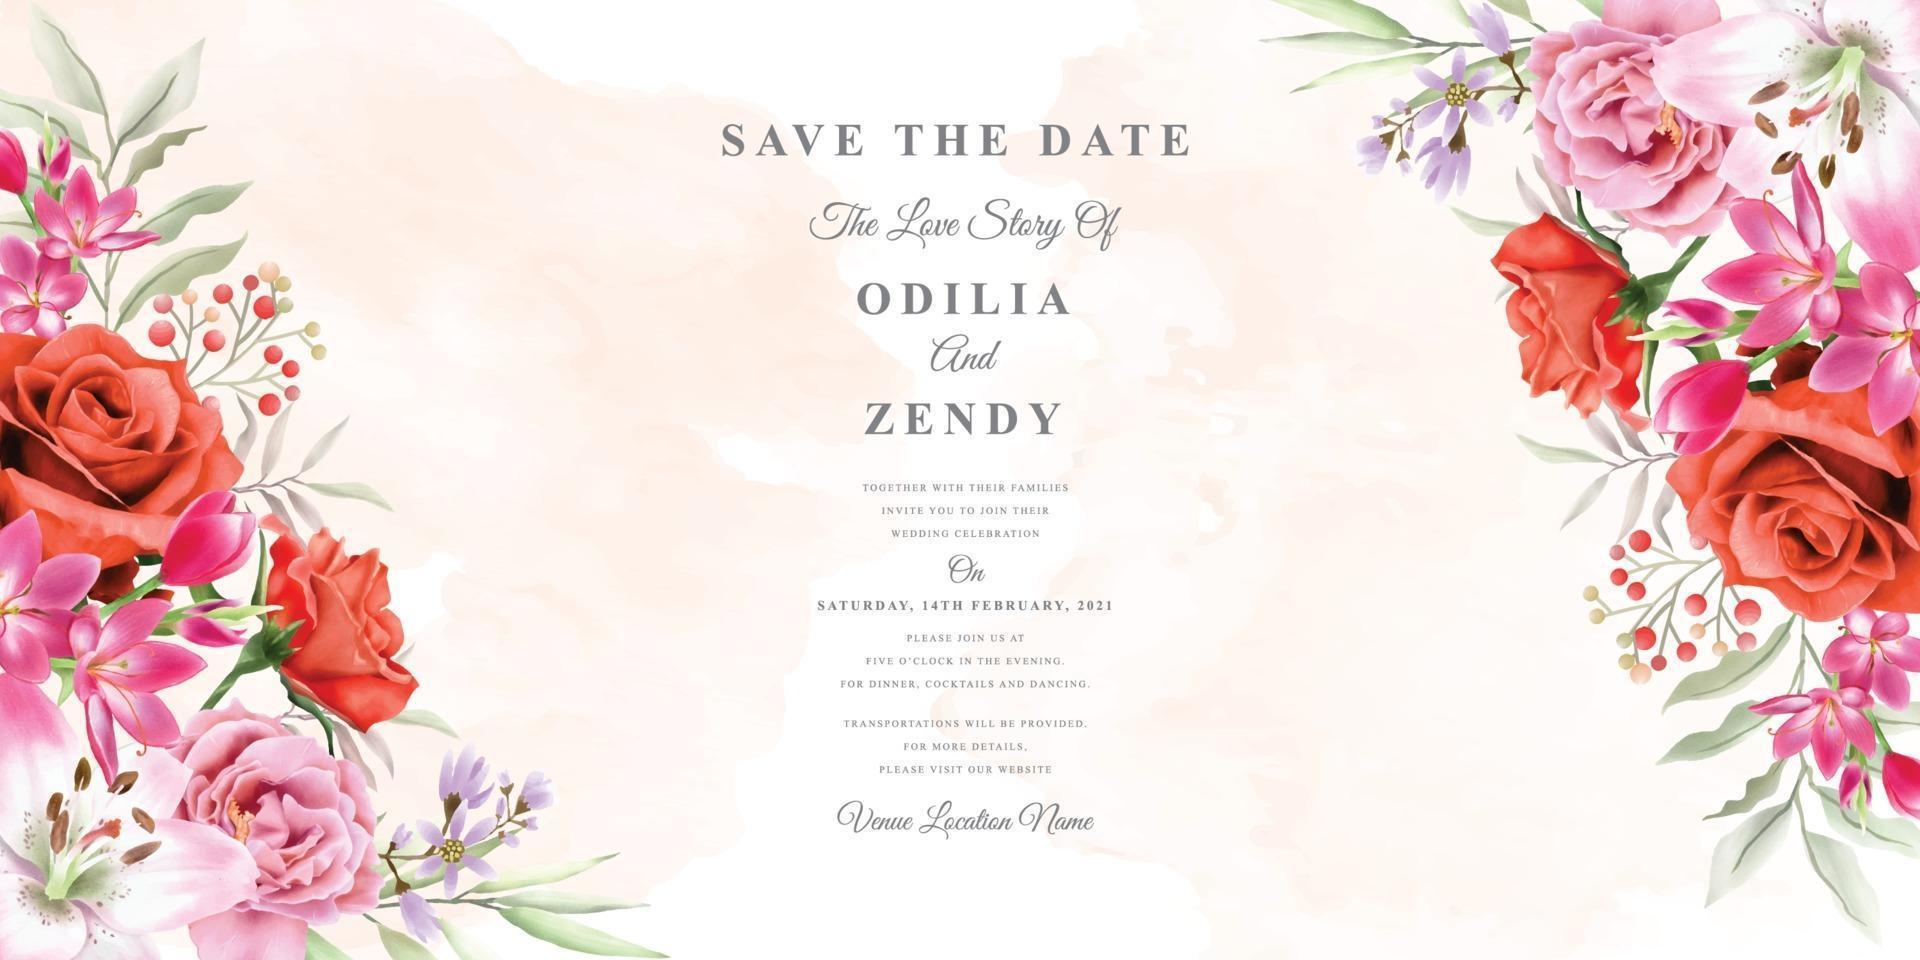 elegant wedding invitation template with beautiful floral design vector